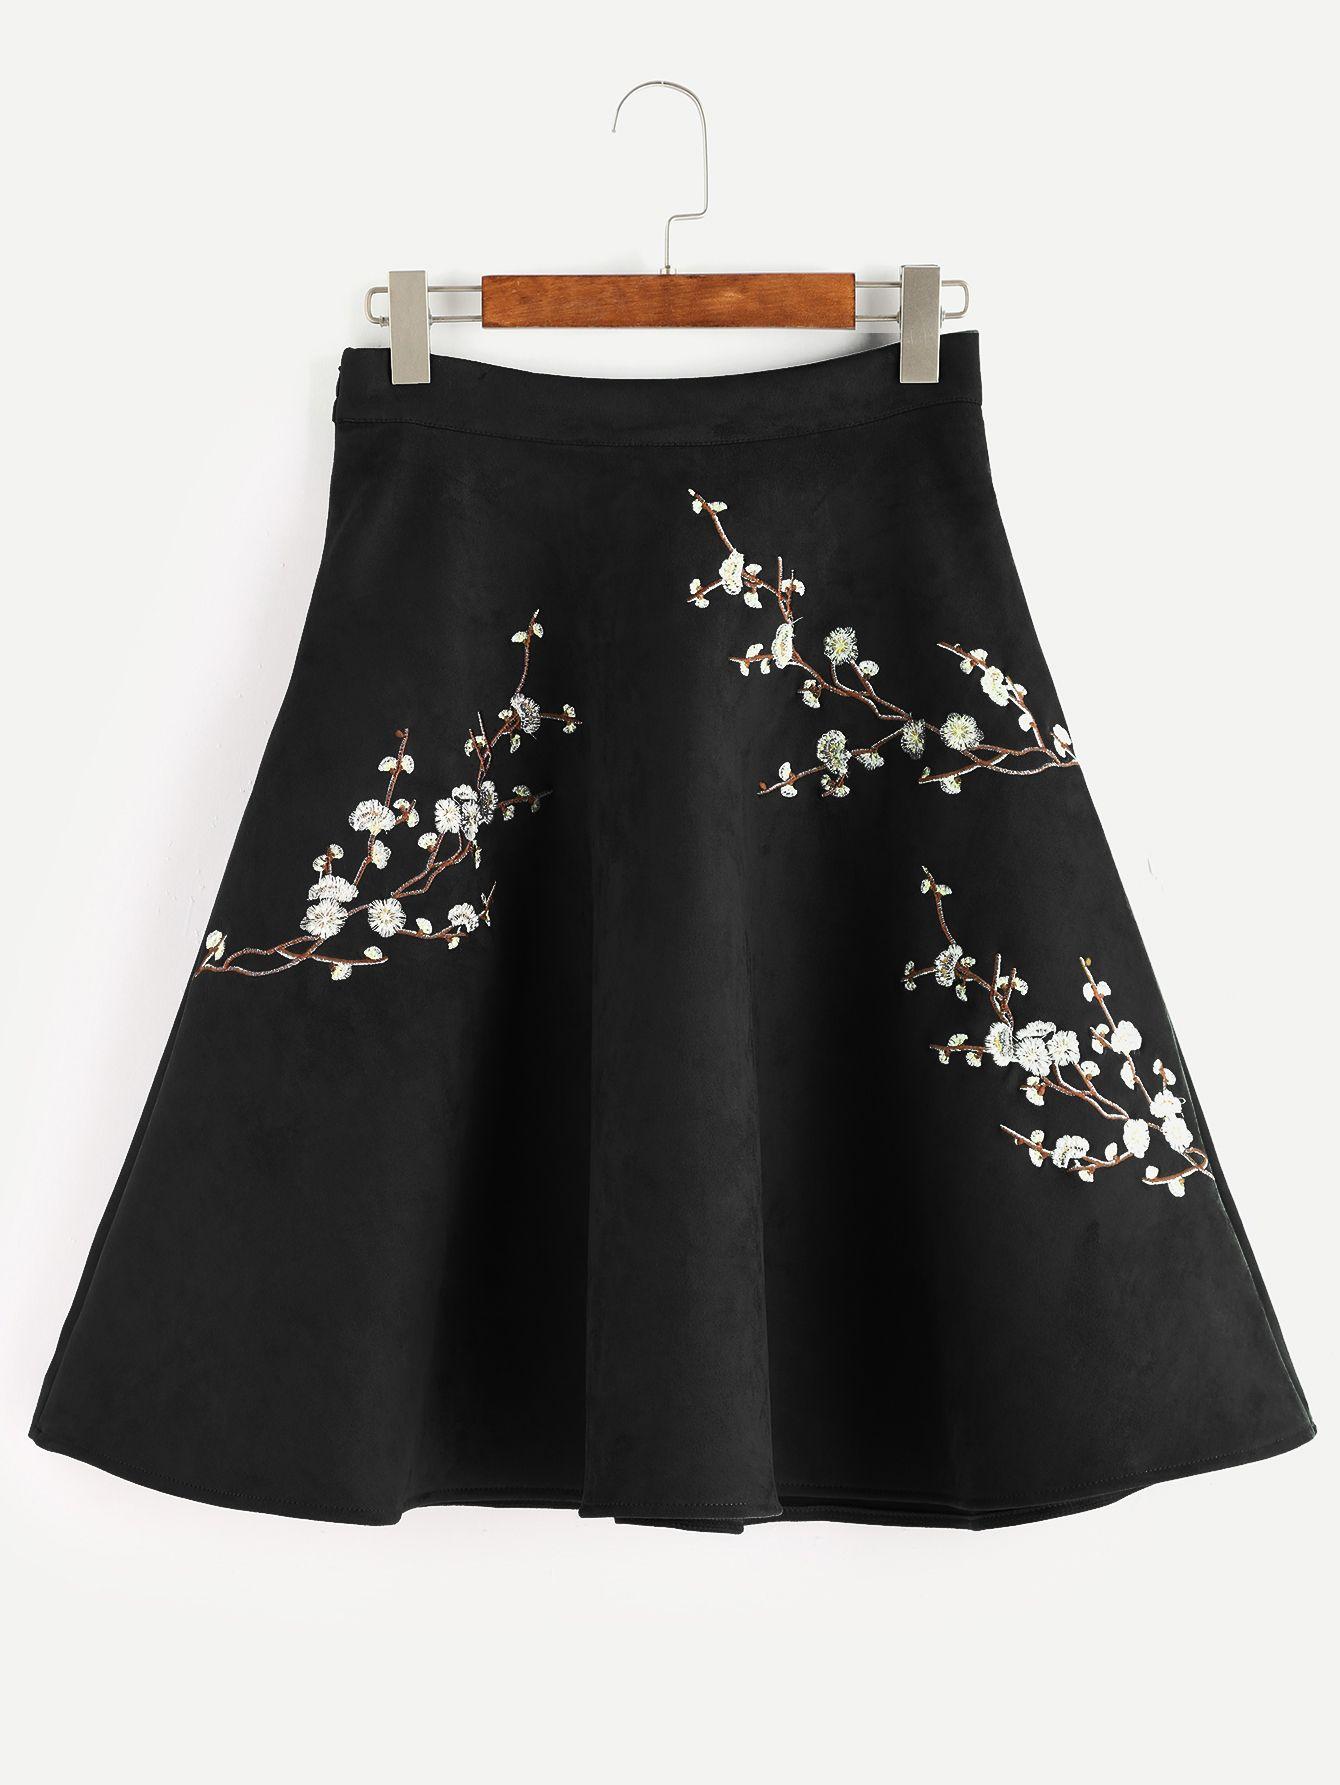 bc565afb0b Black Plum Blossom Embroidered Suede A-Line Skirt -SheIn(Sheinside ...